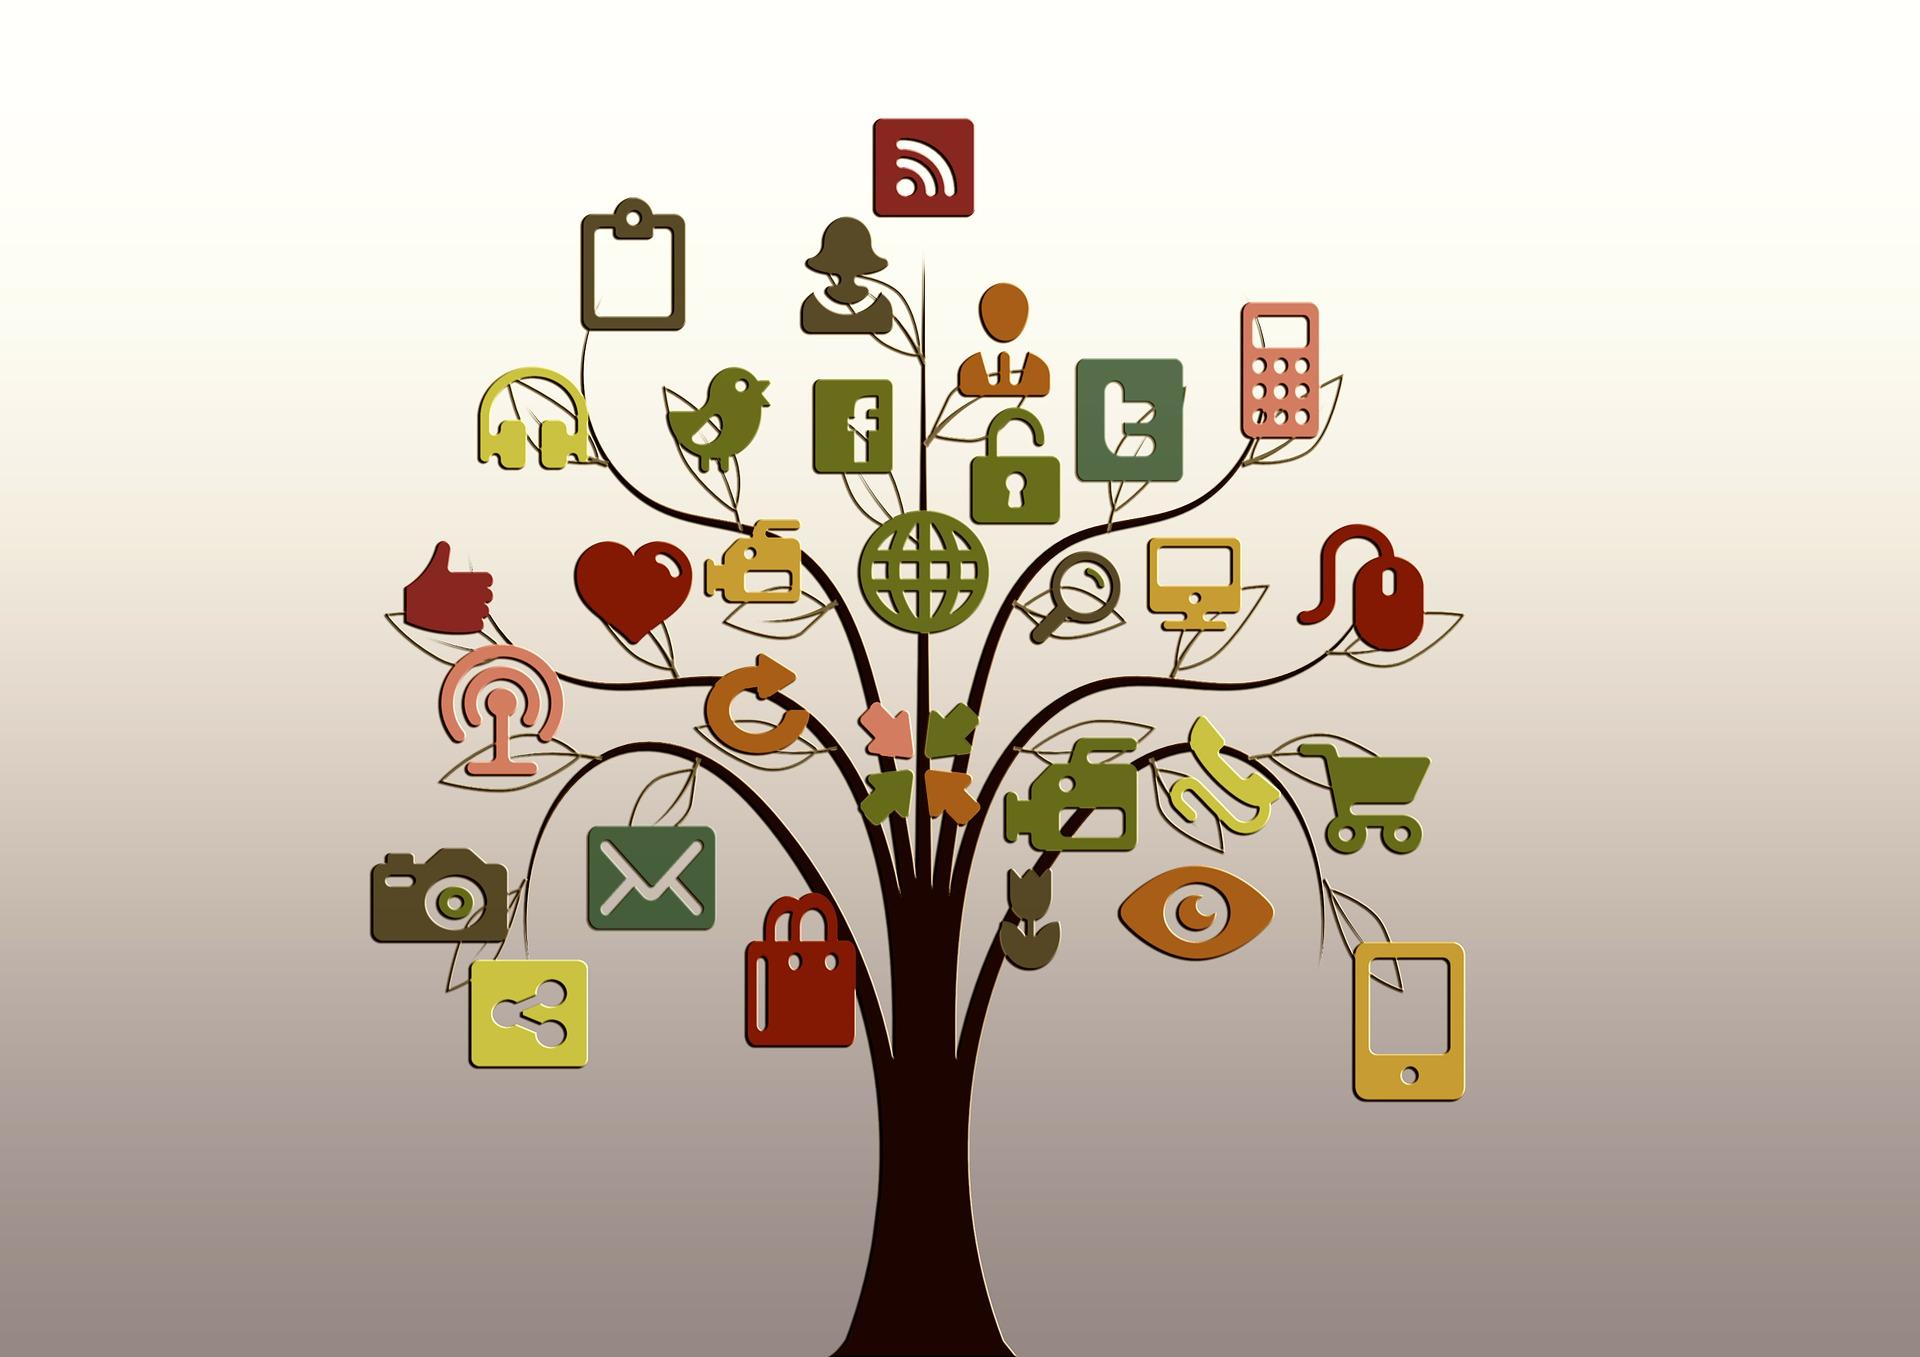 network tree - pixabay.jpg